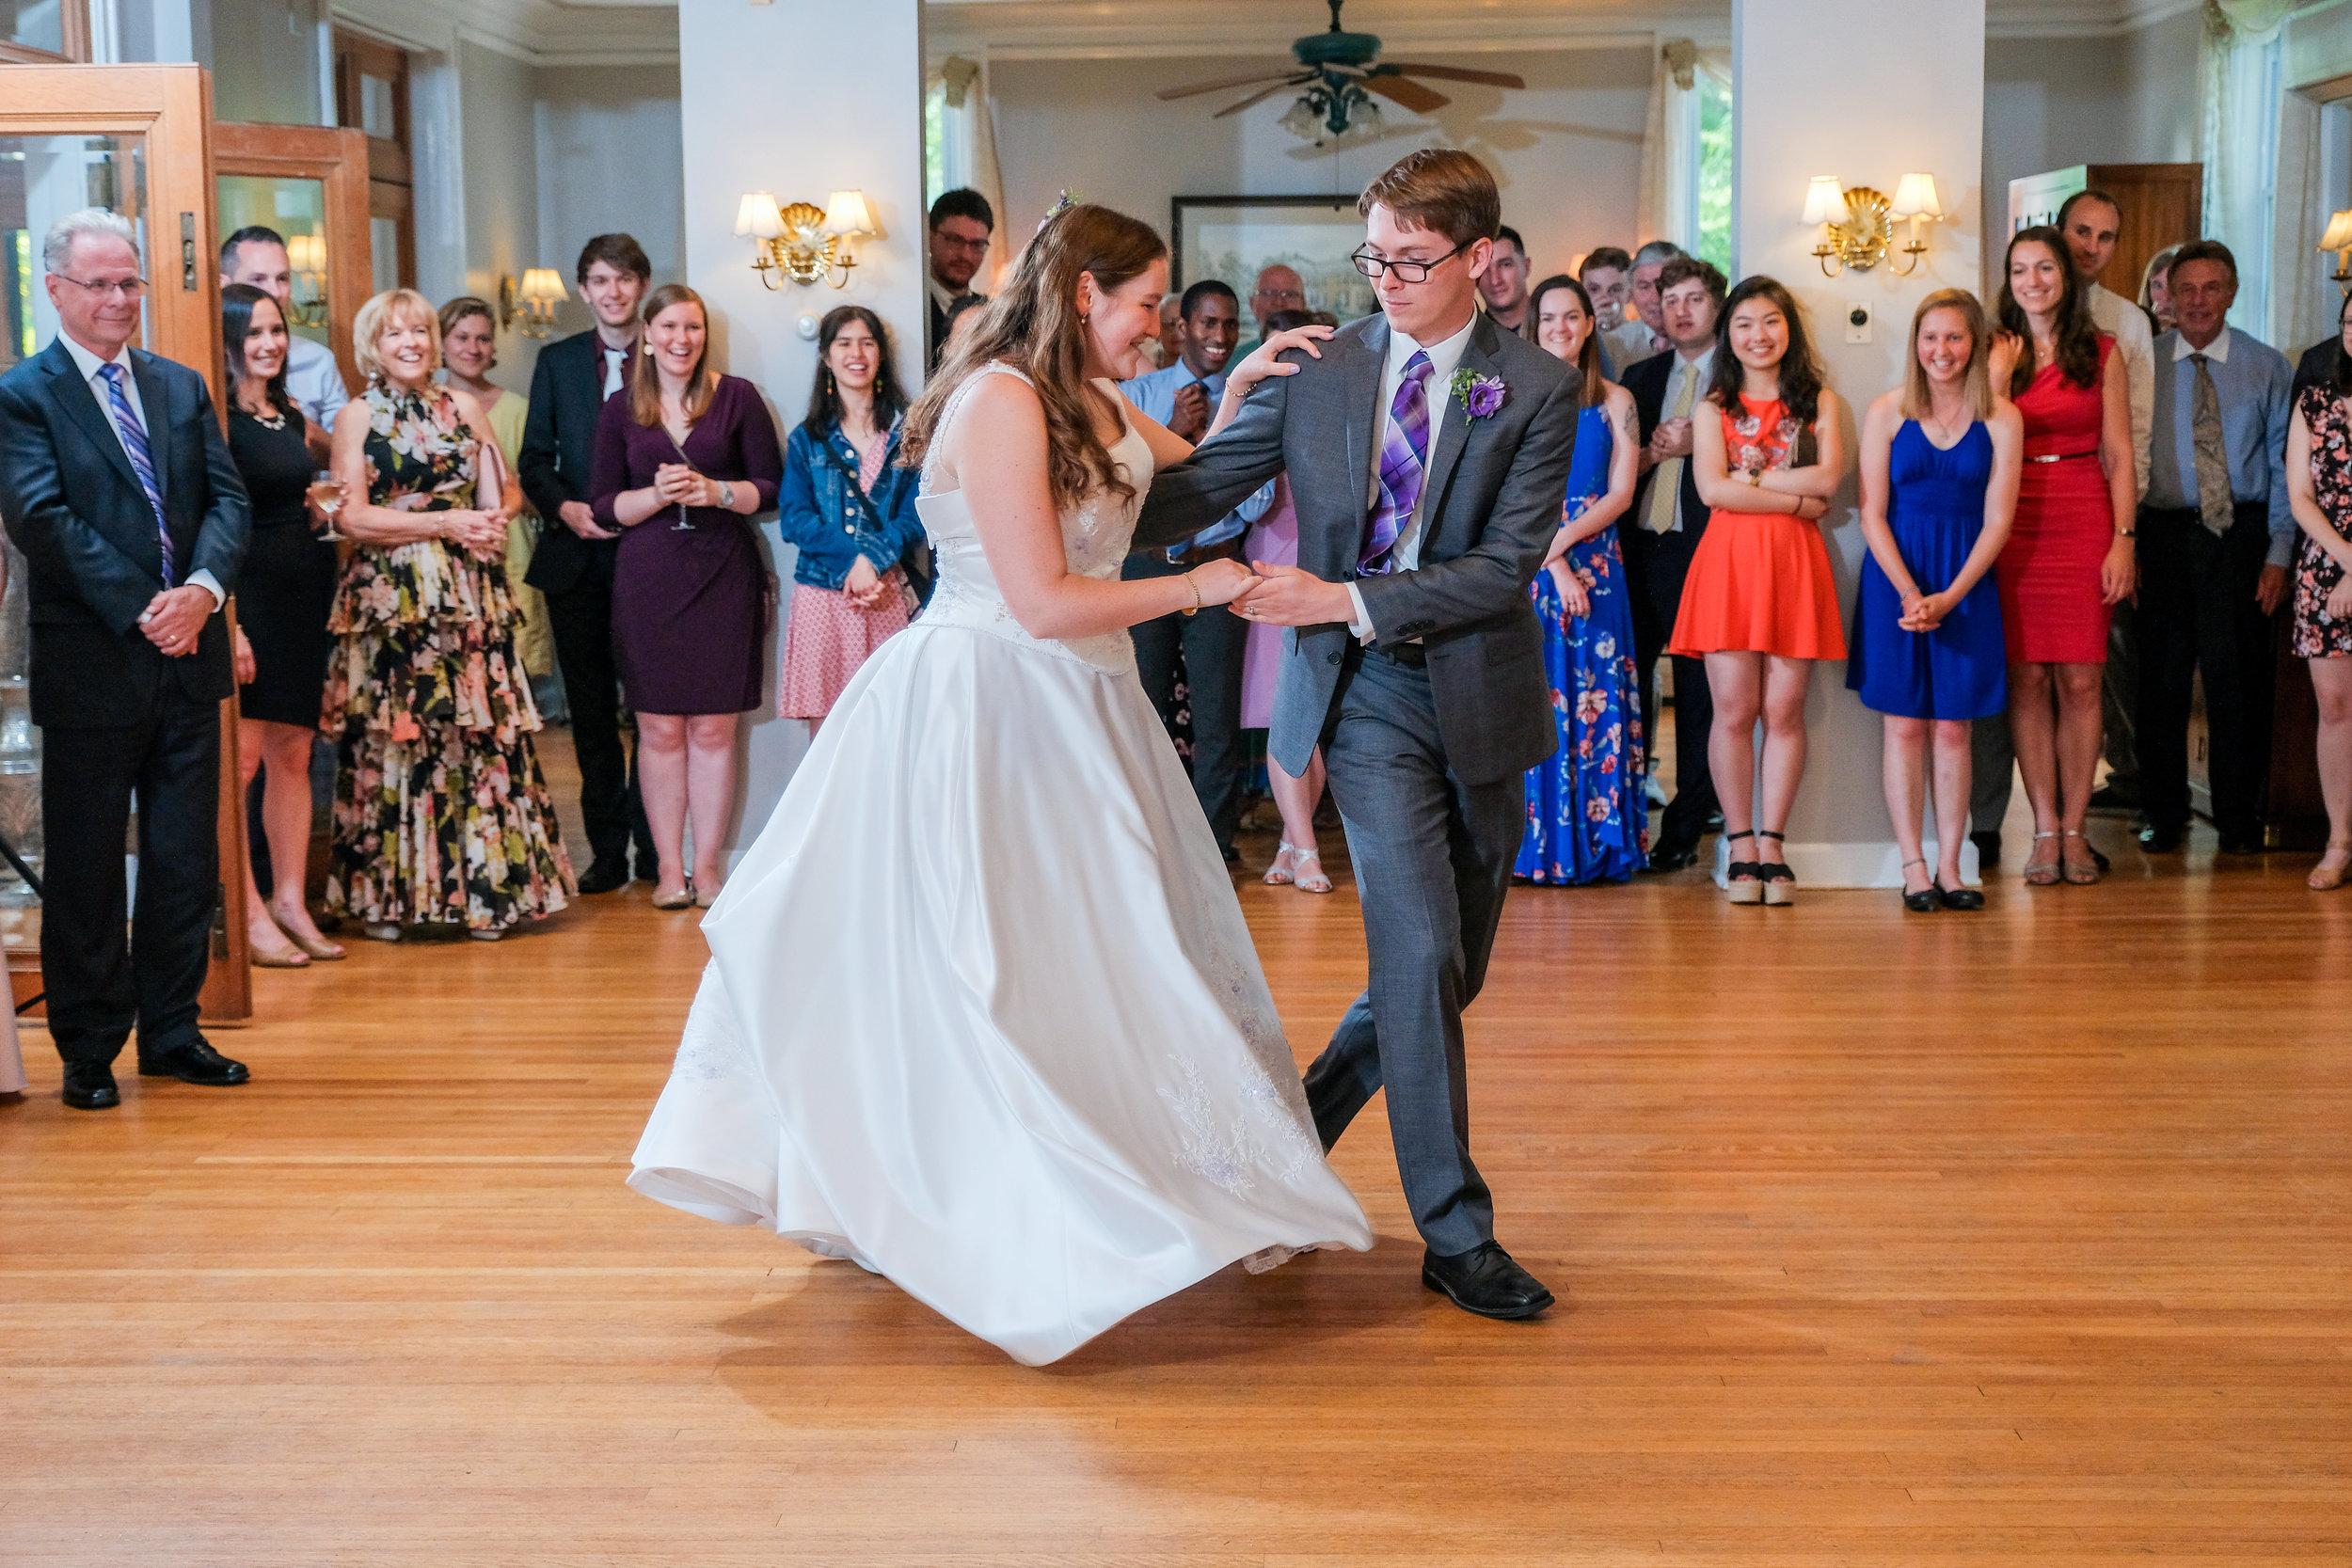 Vermont-Lilac-Inn-Wedding-Photography-1002.jpg